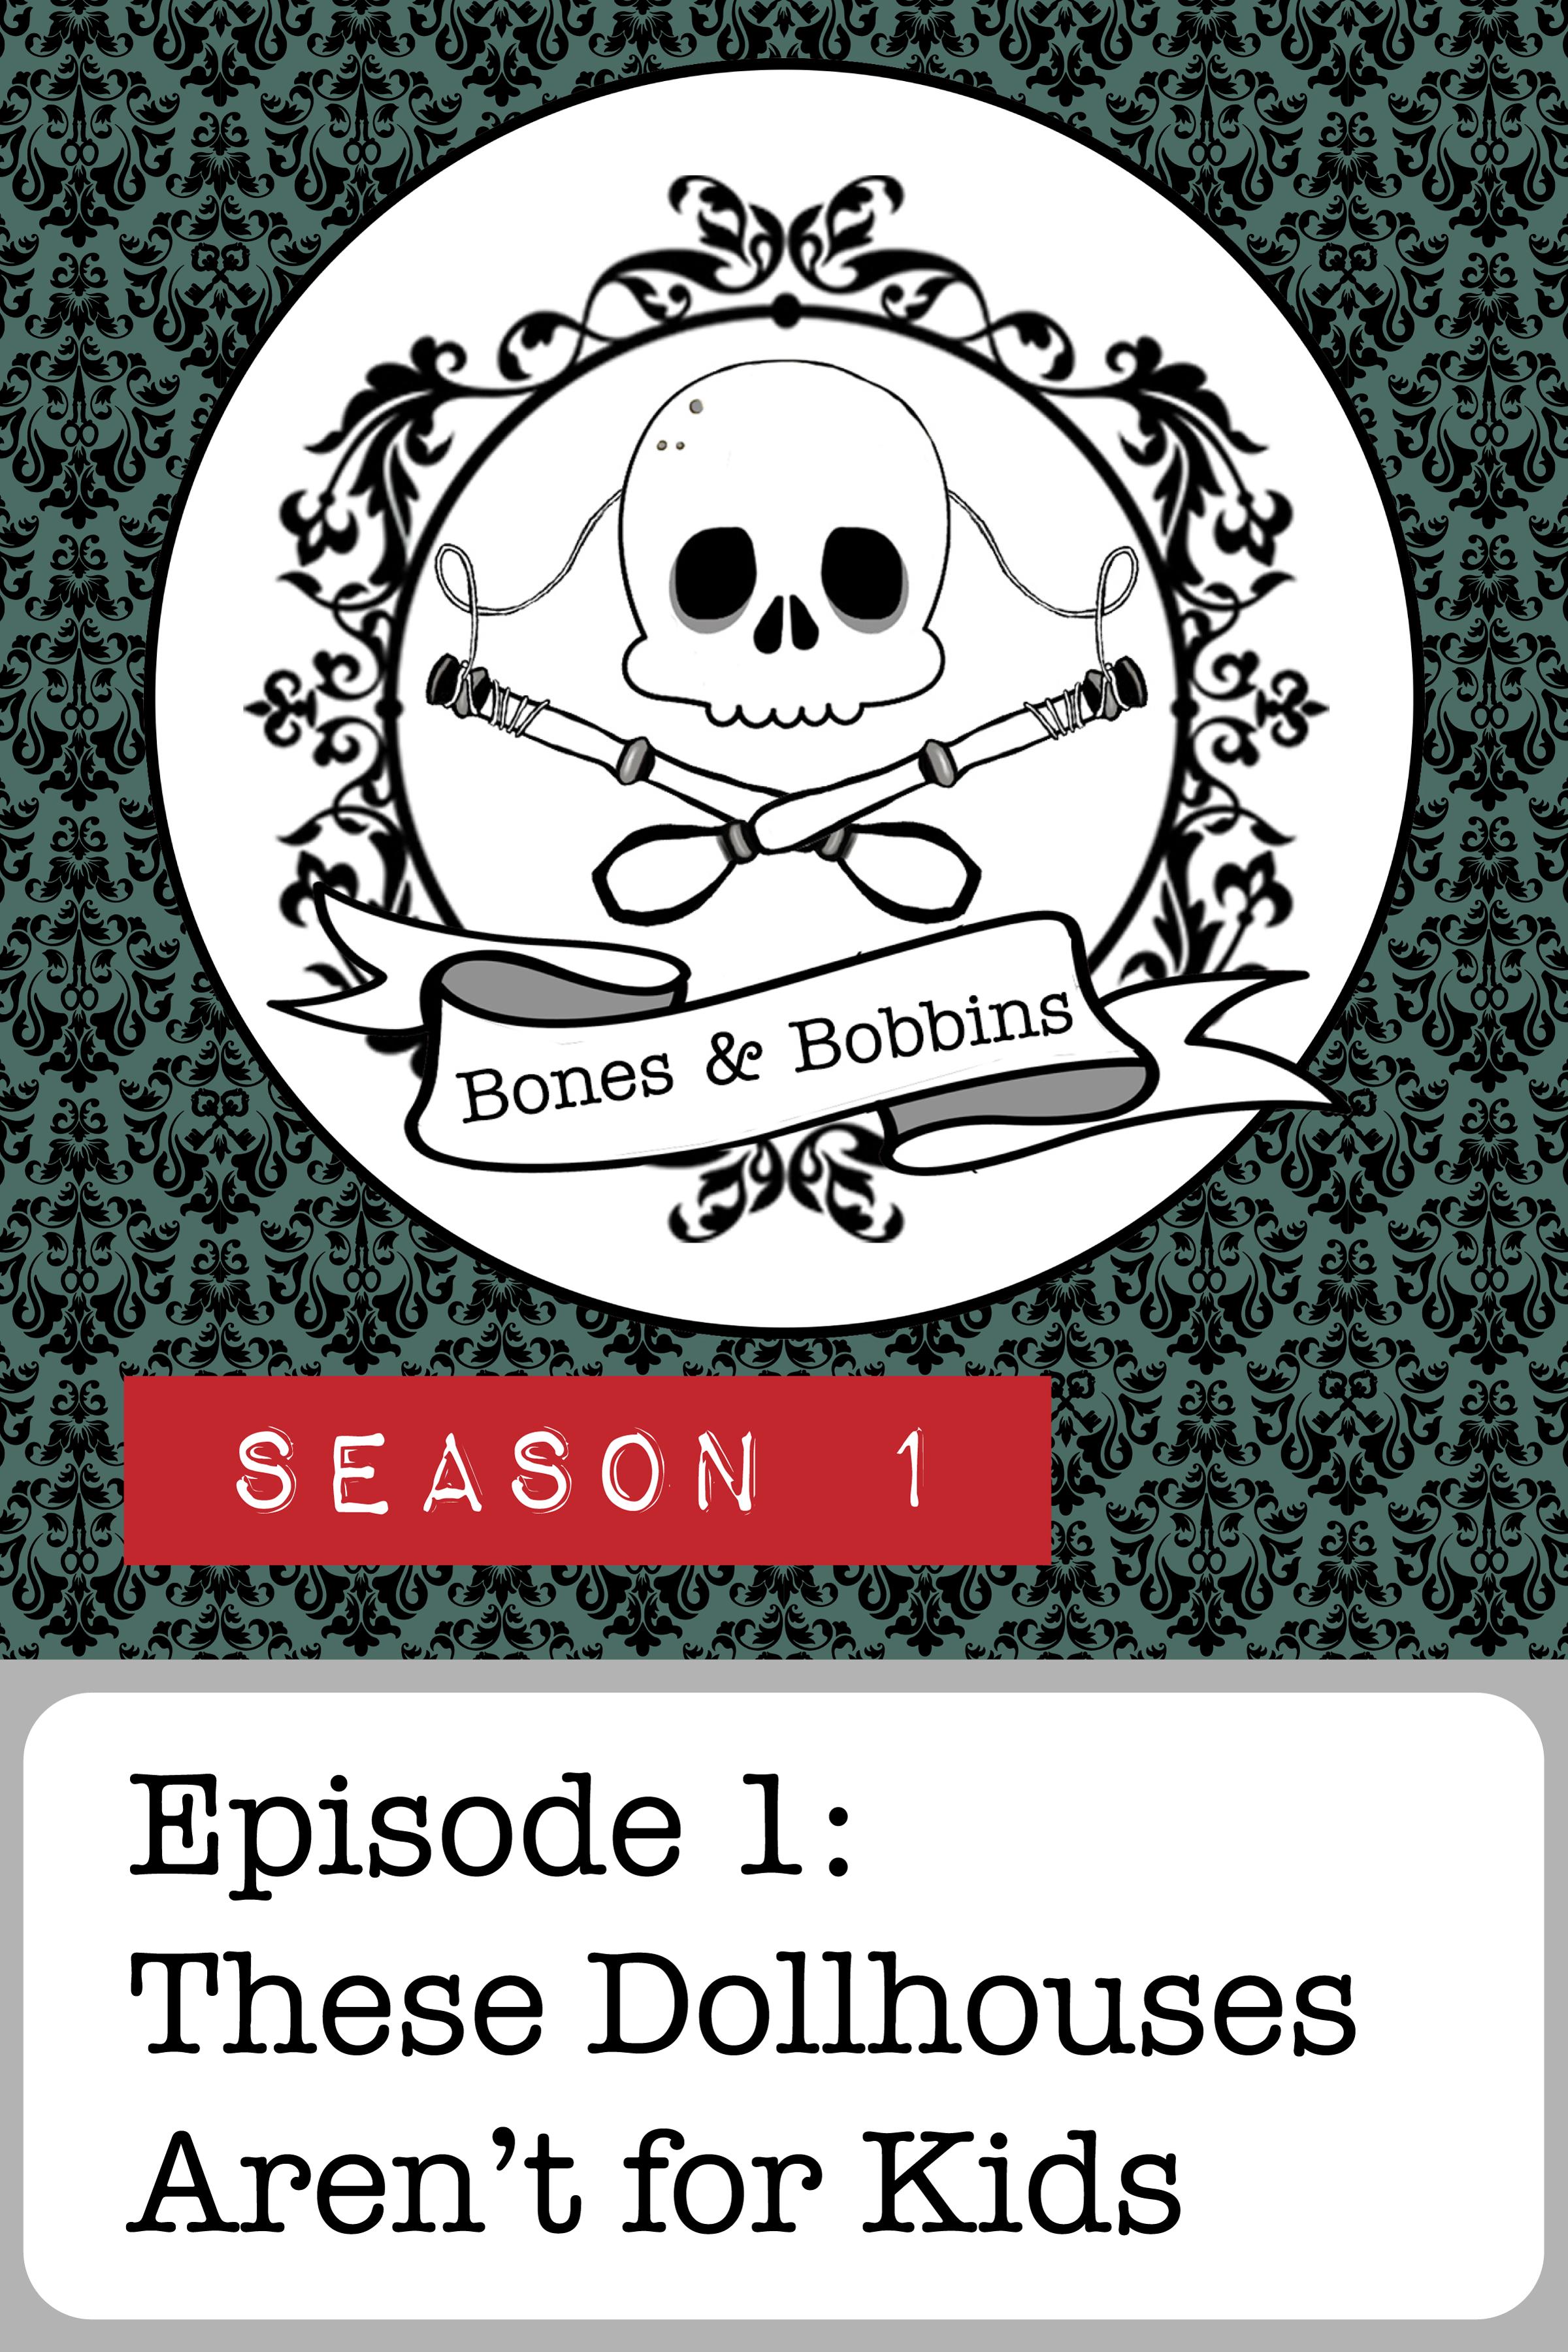 Bones & Bobbins Podcast, Season 1, Episode 1: These Dollhouses Aren't for Kids